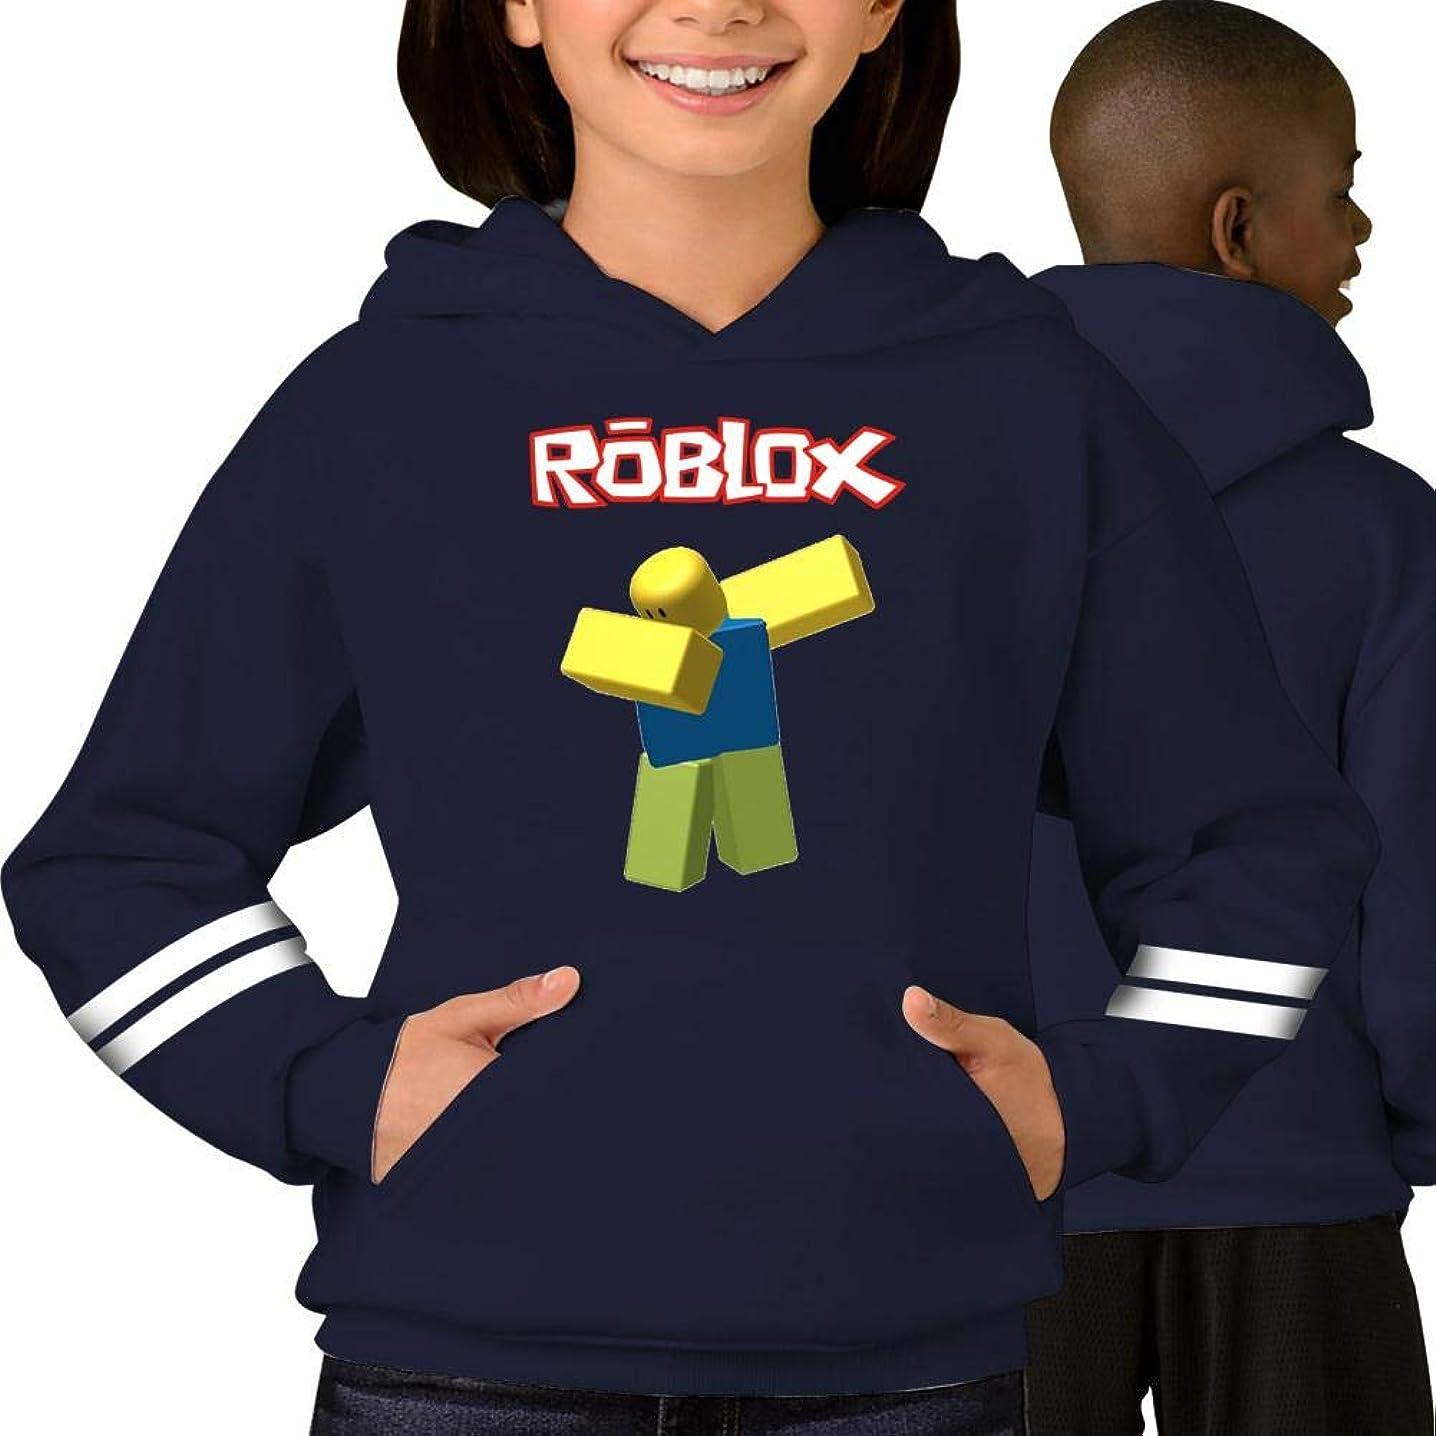 Tougouqus rob-lox World Fashionable Adolescent Children Boys and Girls Hoodies